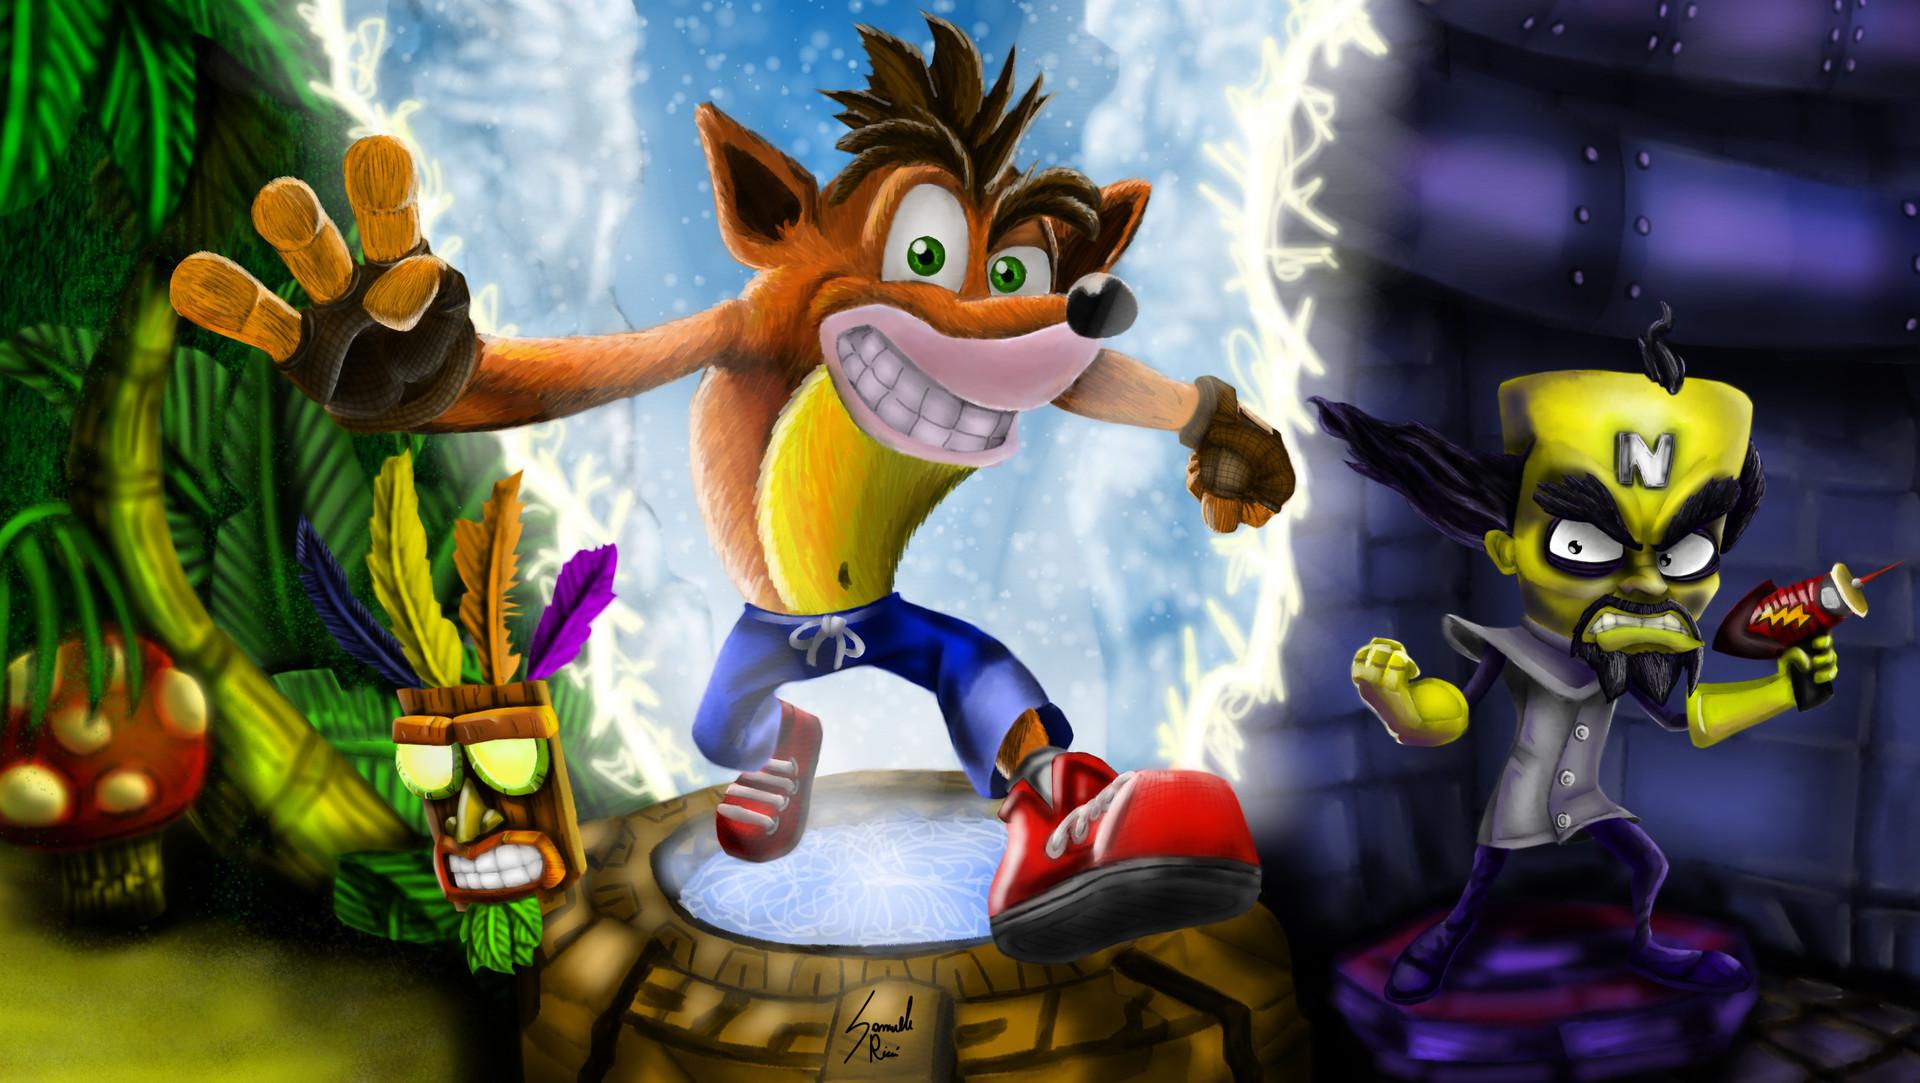 Crash Bandicoot N Sane Trilogy Artwork Hd Wallpaper Background